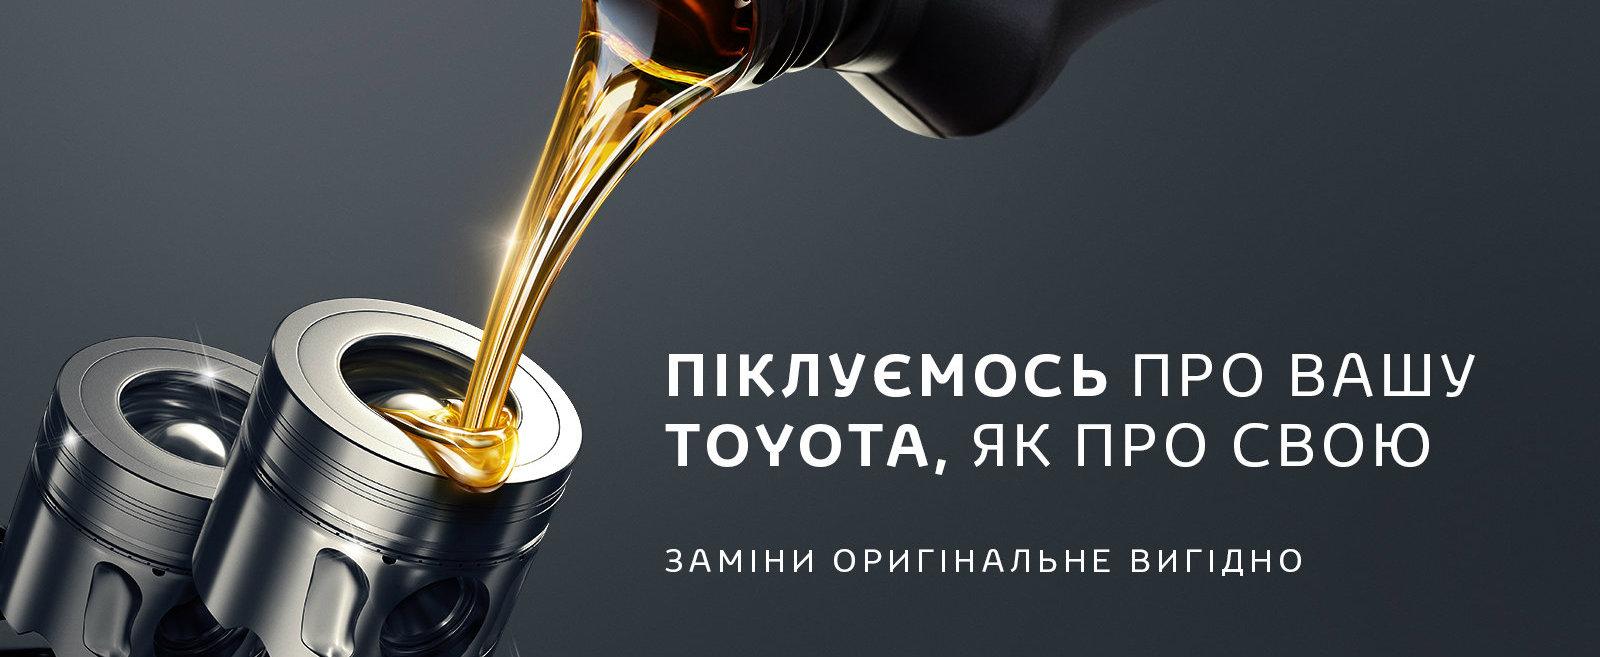 Toyota-OffService.jpg